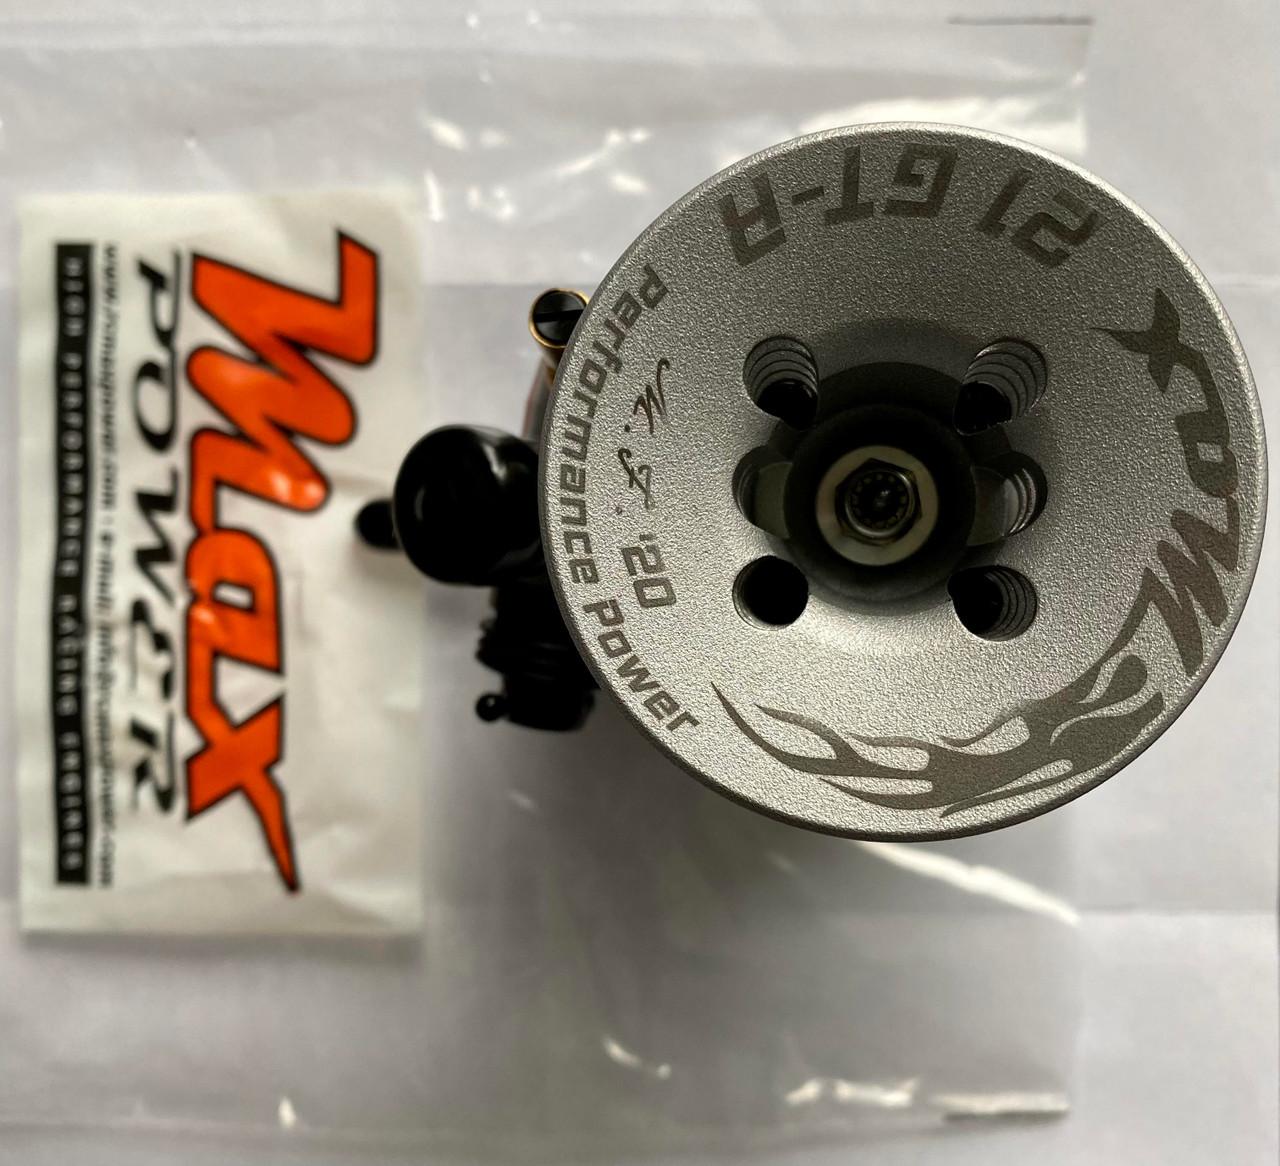 MX-21-MAX-GT-RX - .21 Max Power GT Engine